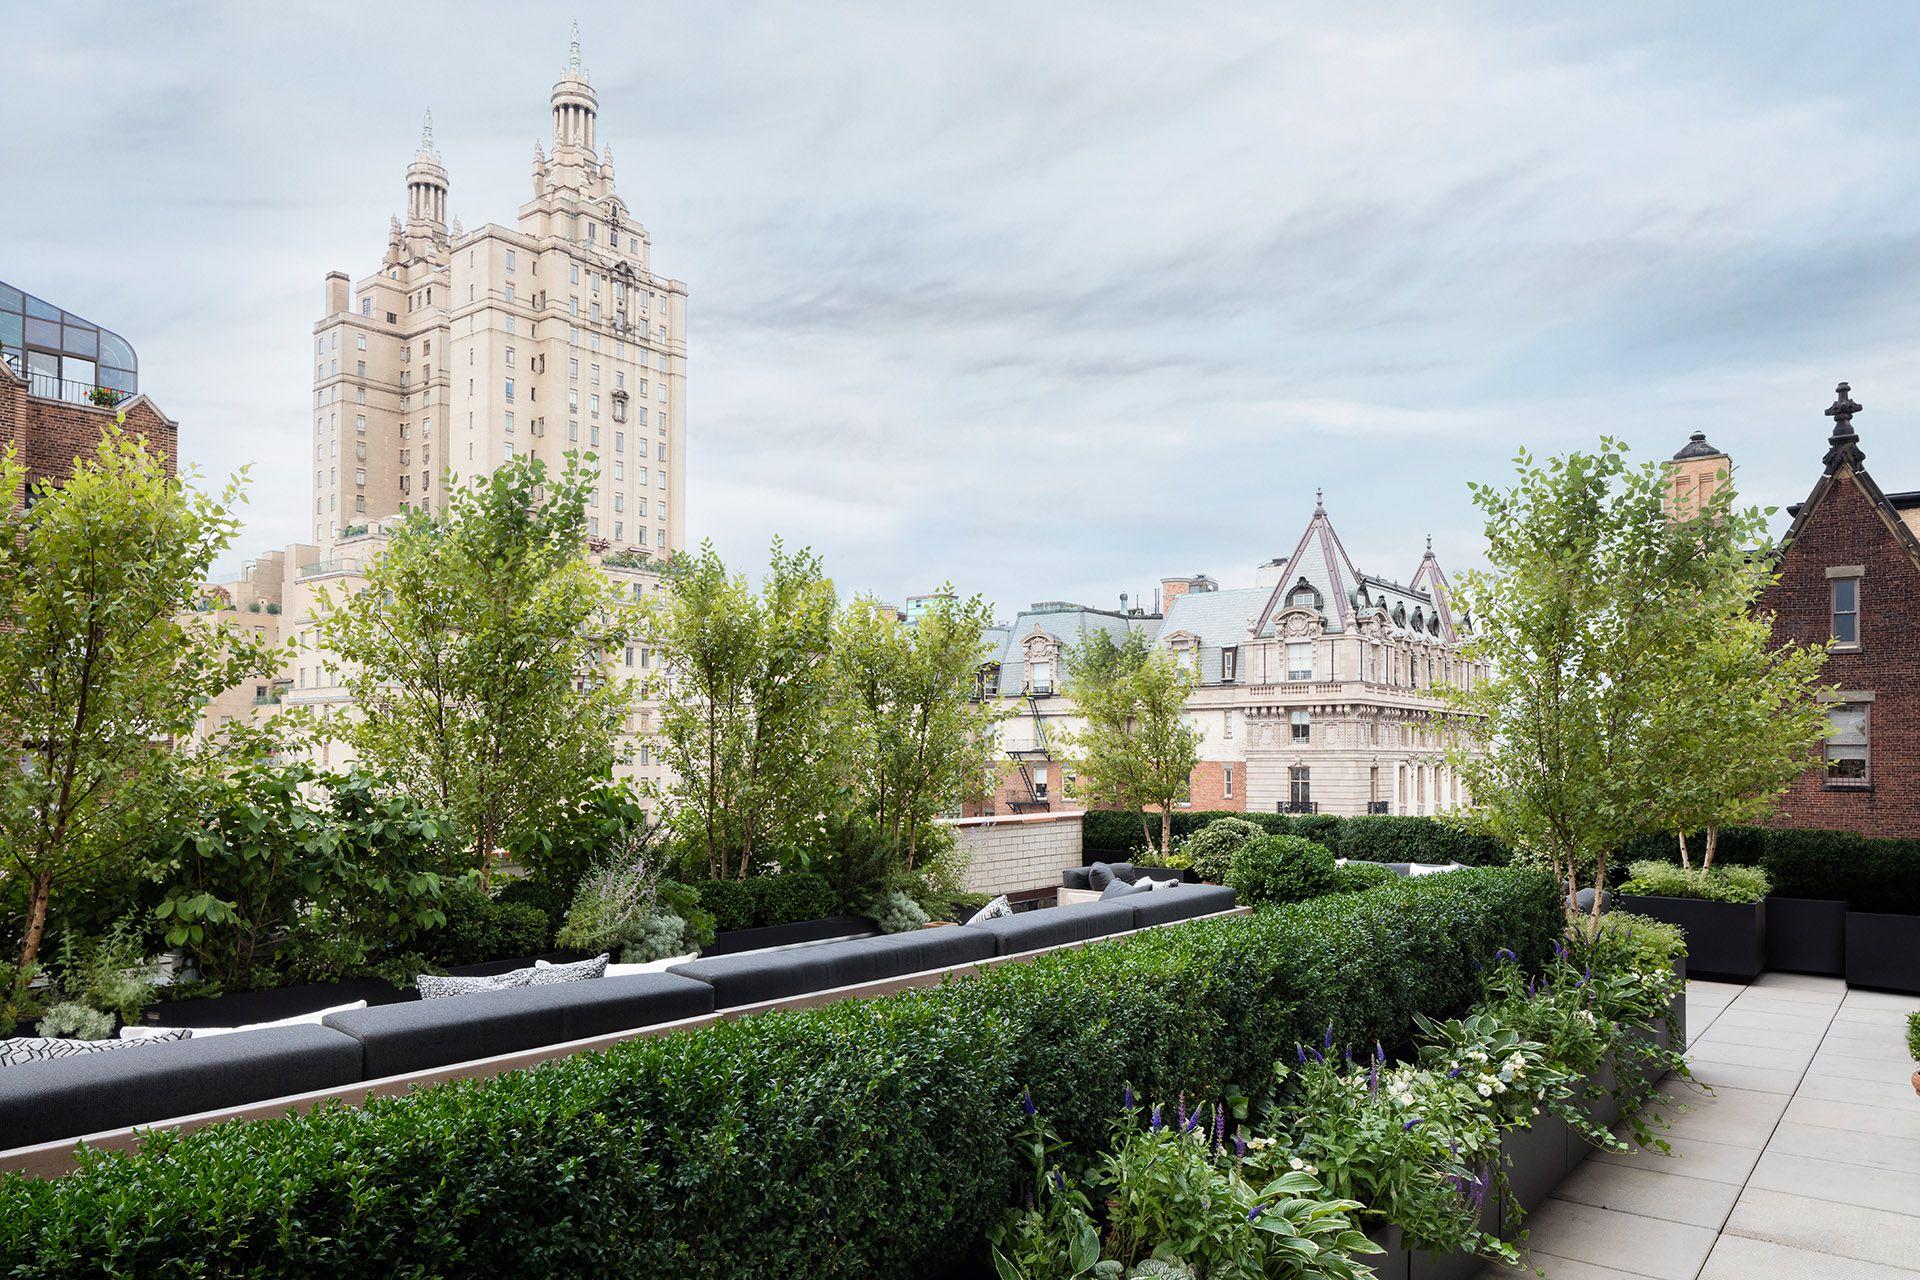 Upper West Side Harrison Green In 2020 Rooftop Garden Nyc Landscape Design Rooftop Garden